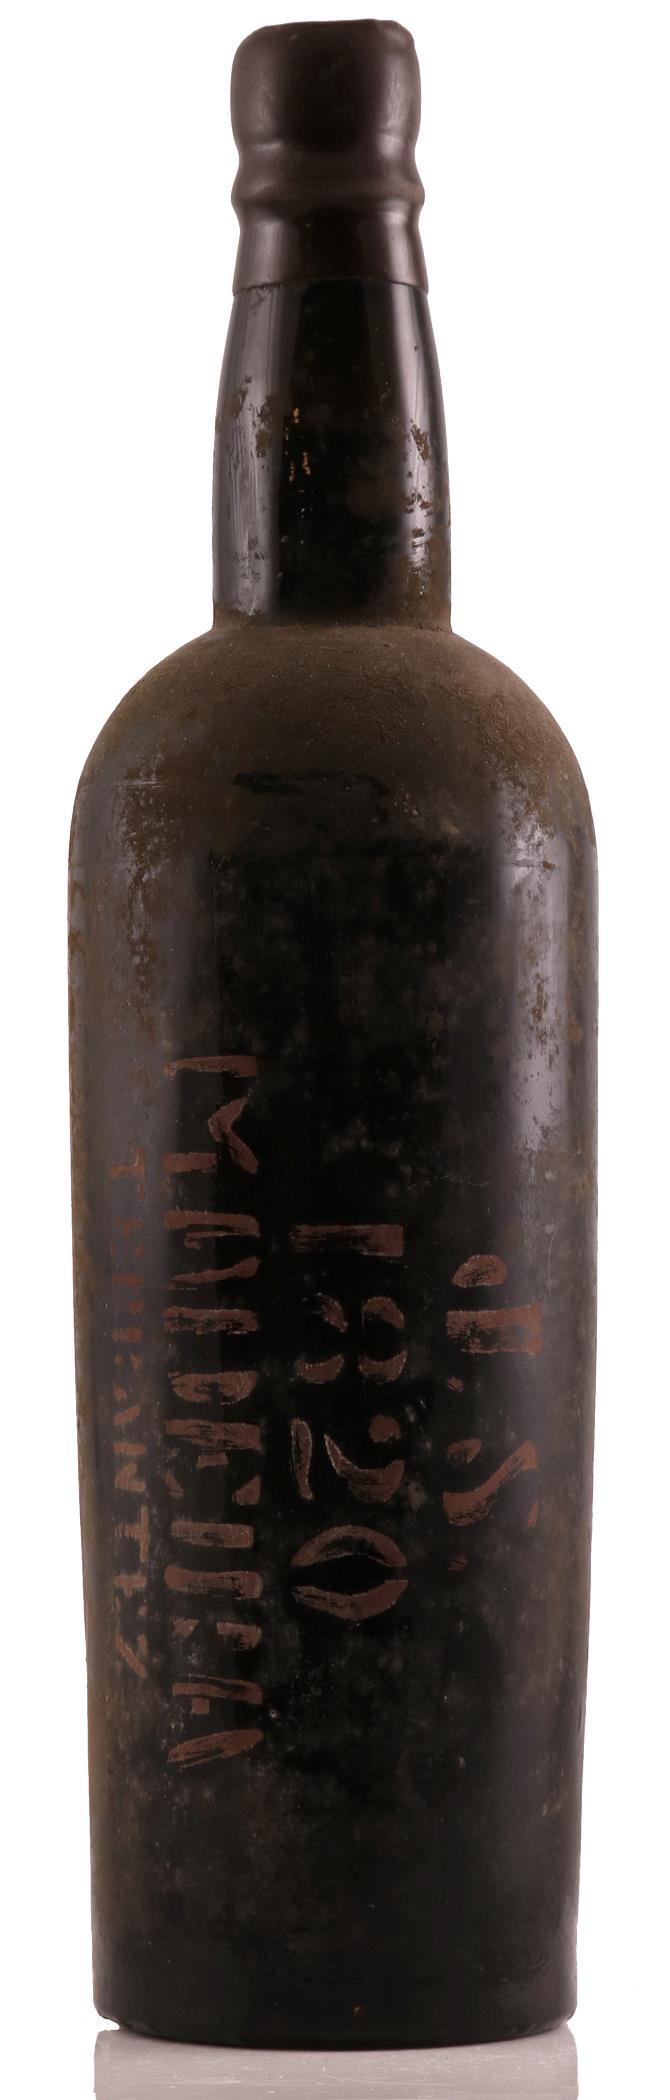 Madeira 1820 J.S.